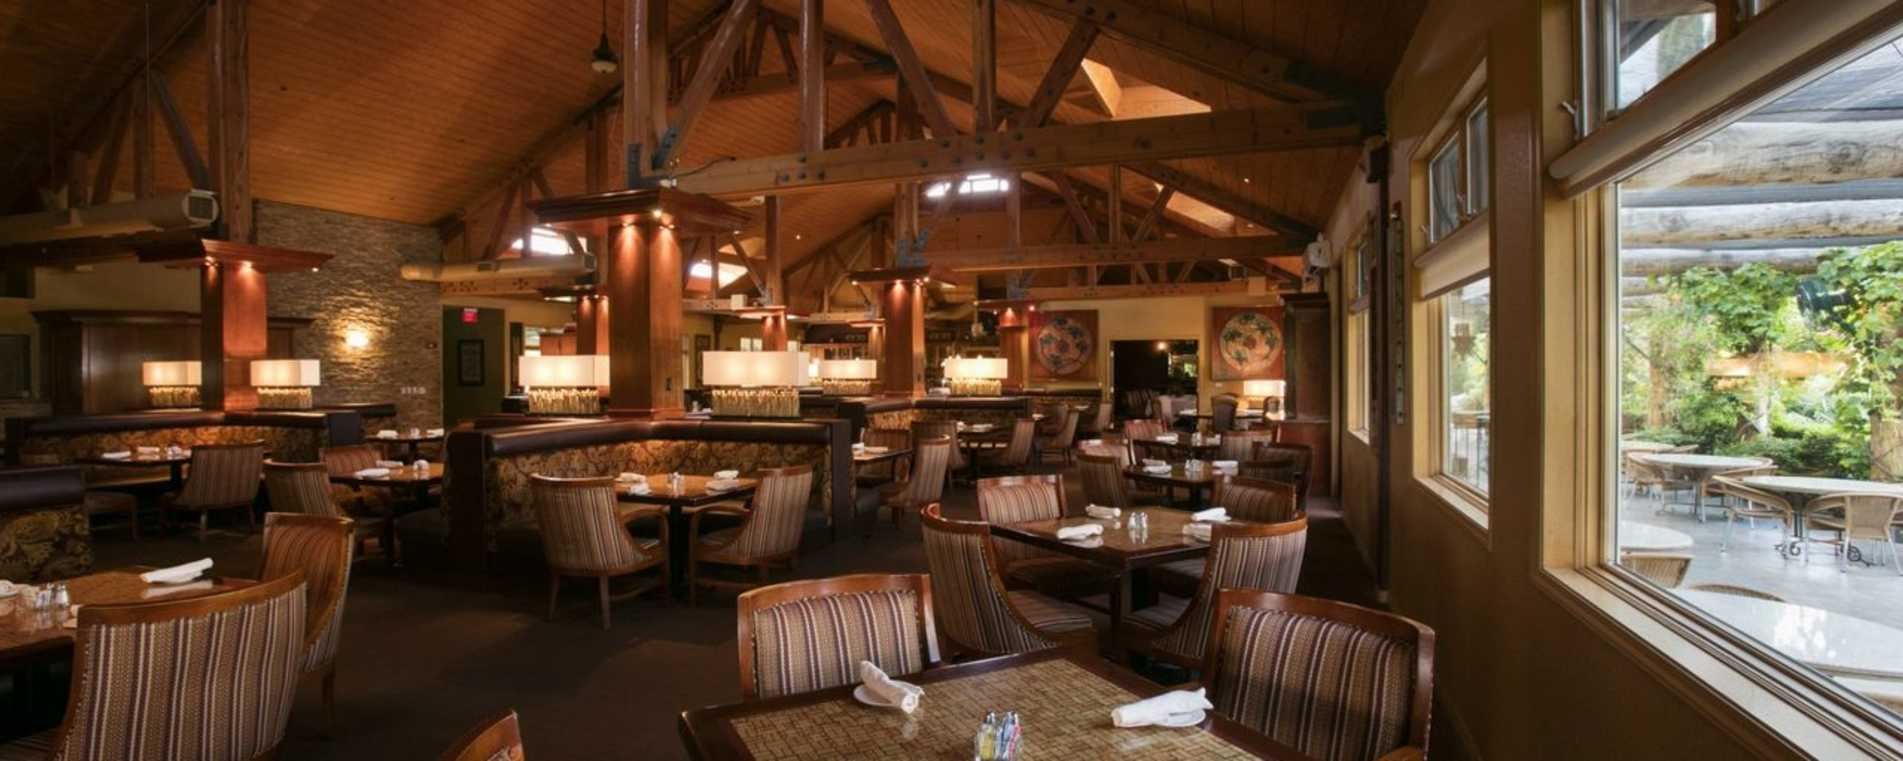 The Vineyard Rose Restaurant - South Coast Winery Resort & Spa